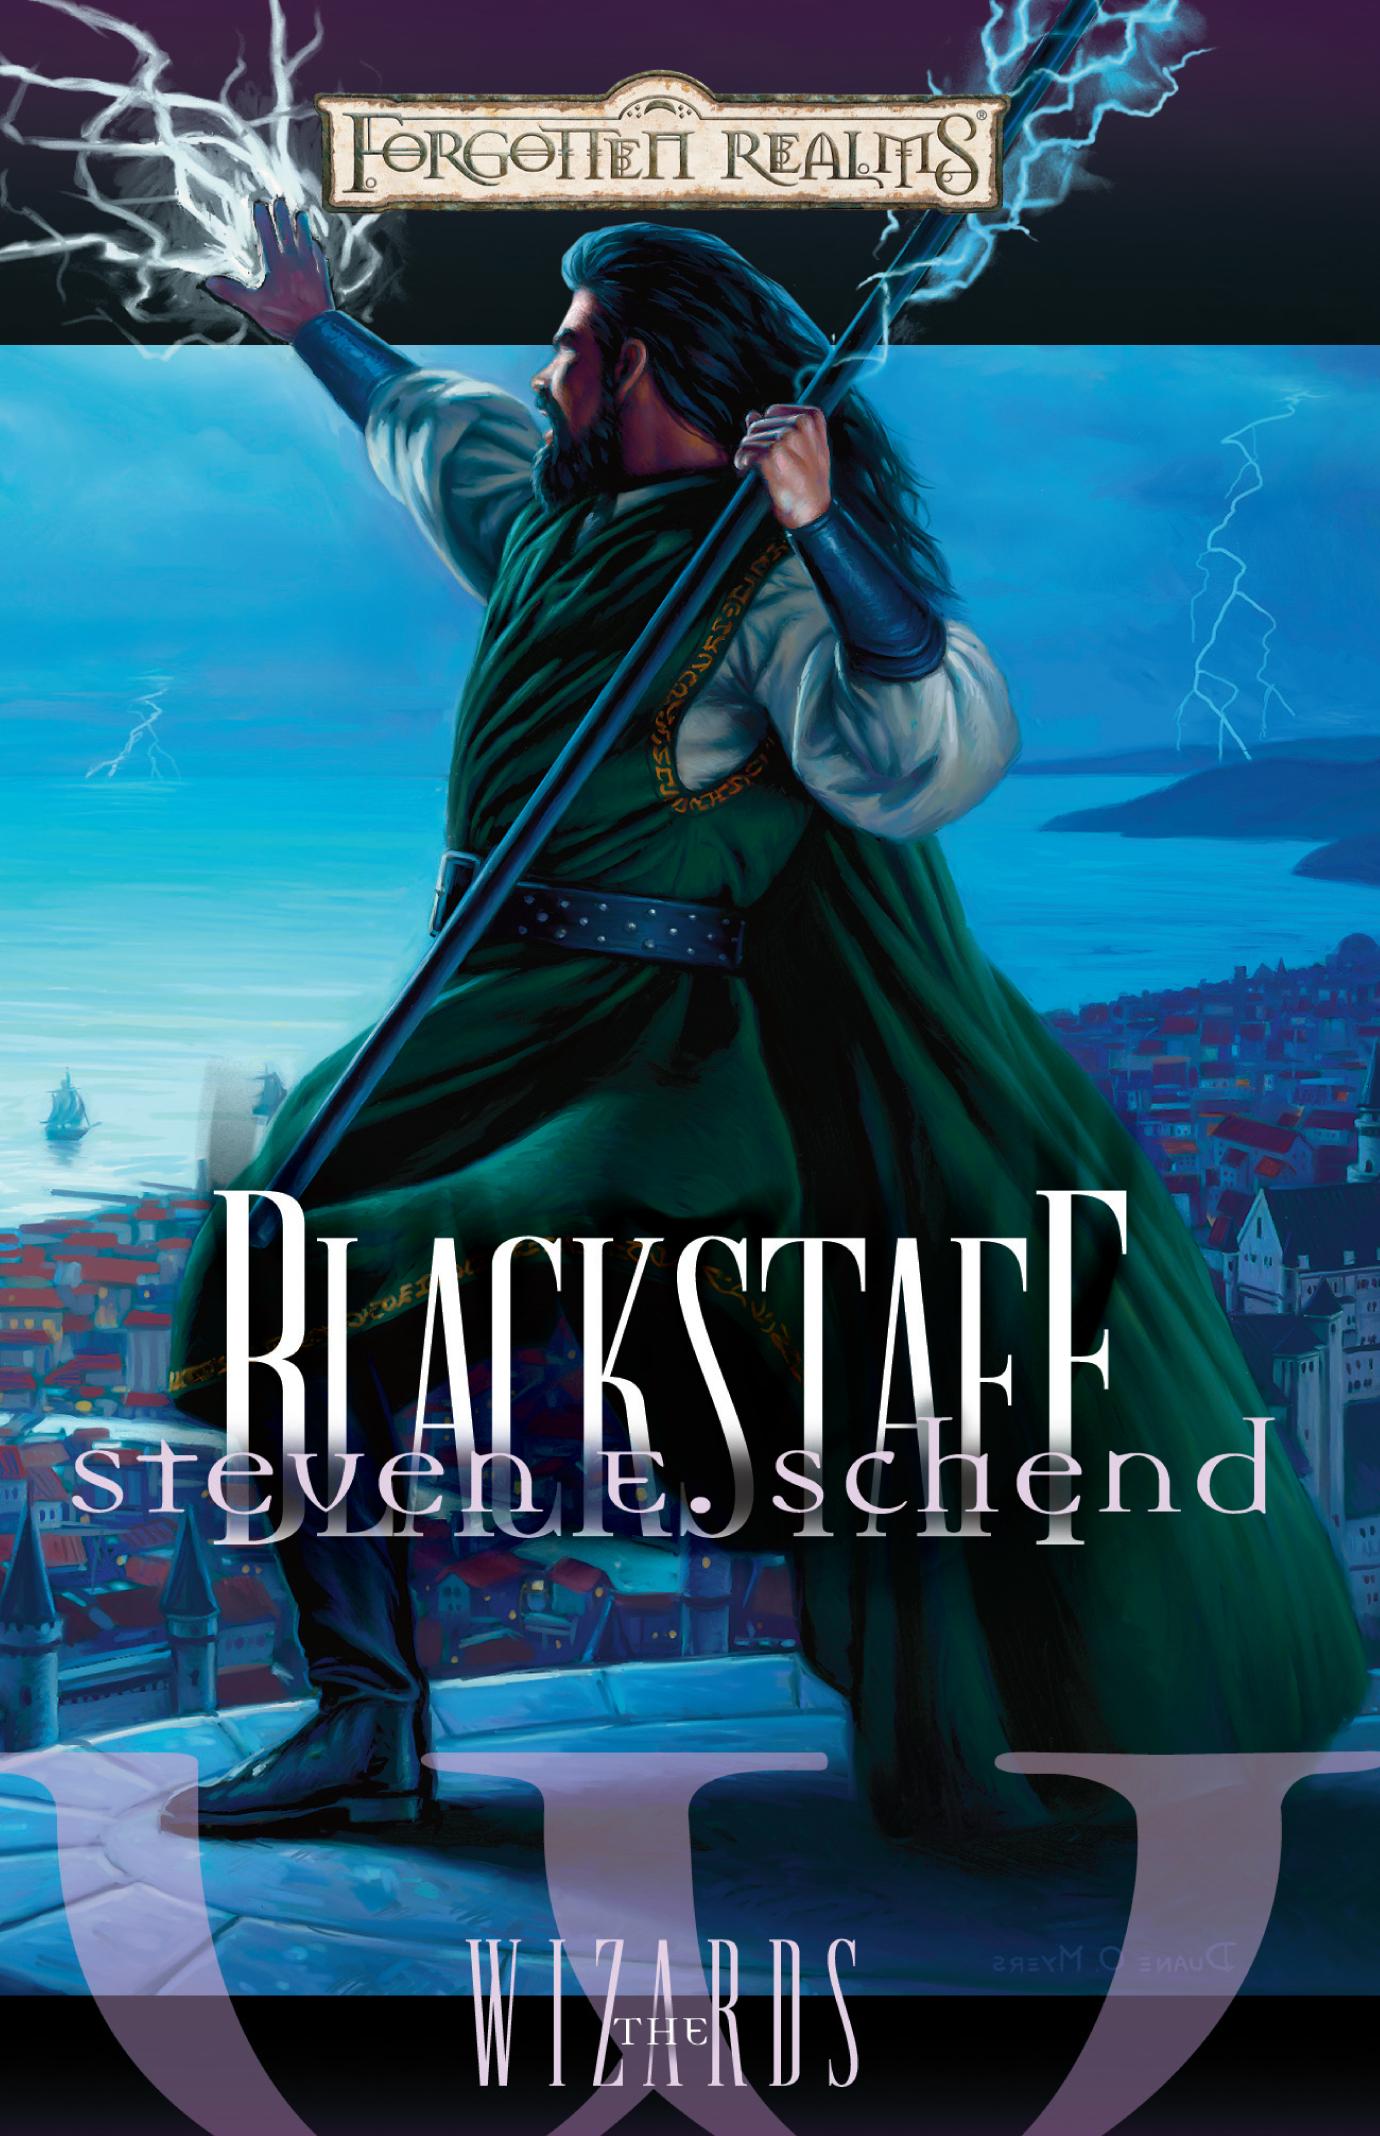 Blackstaff (novel)